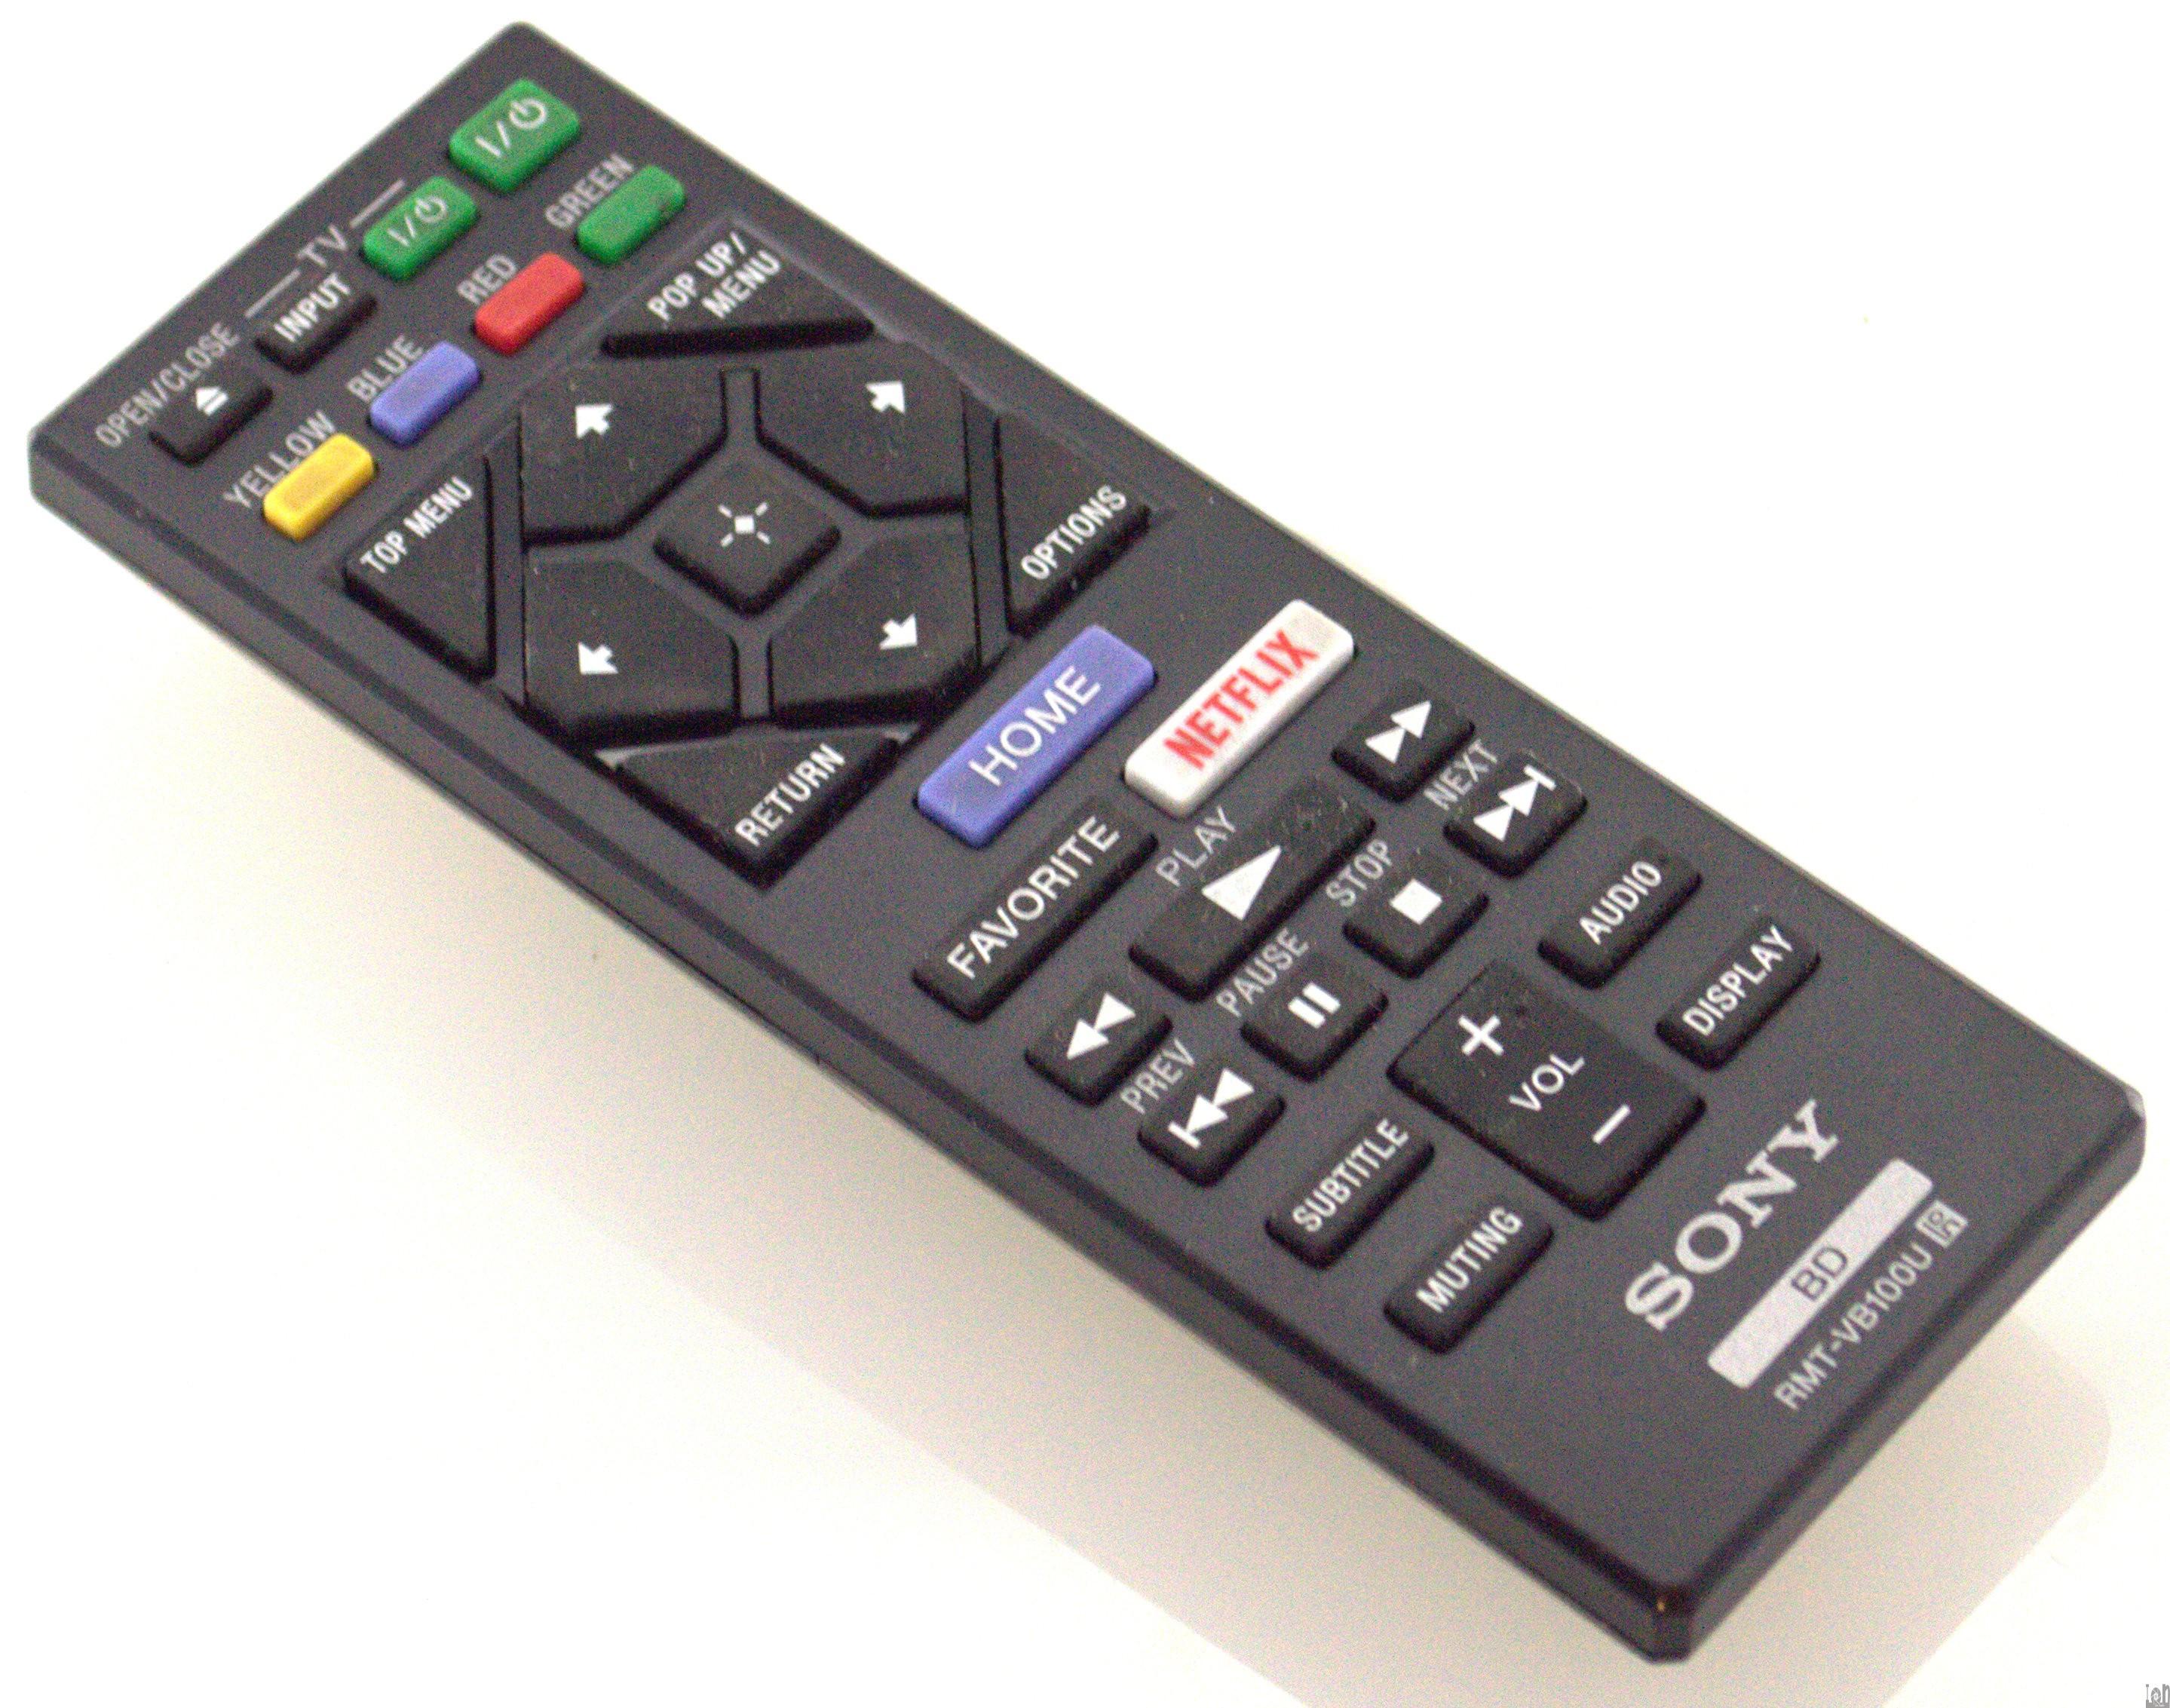 RMT-VB100U Sony Remote Control Blu Ray Player